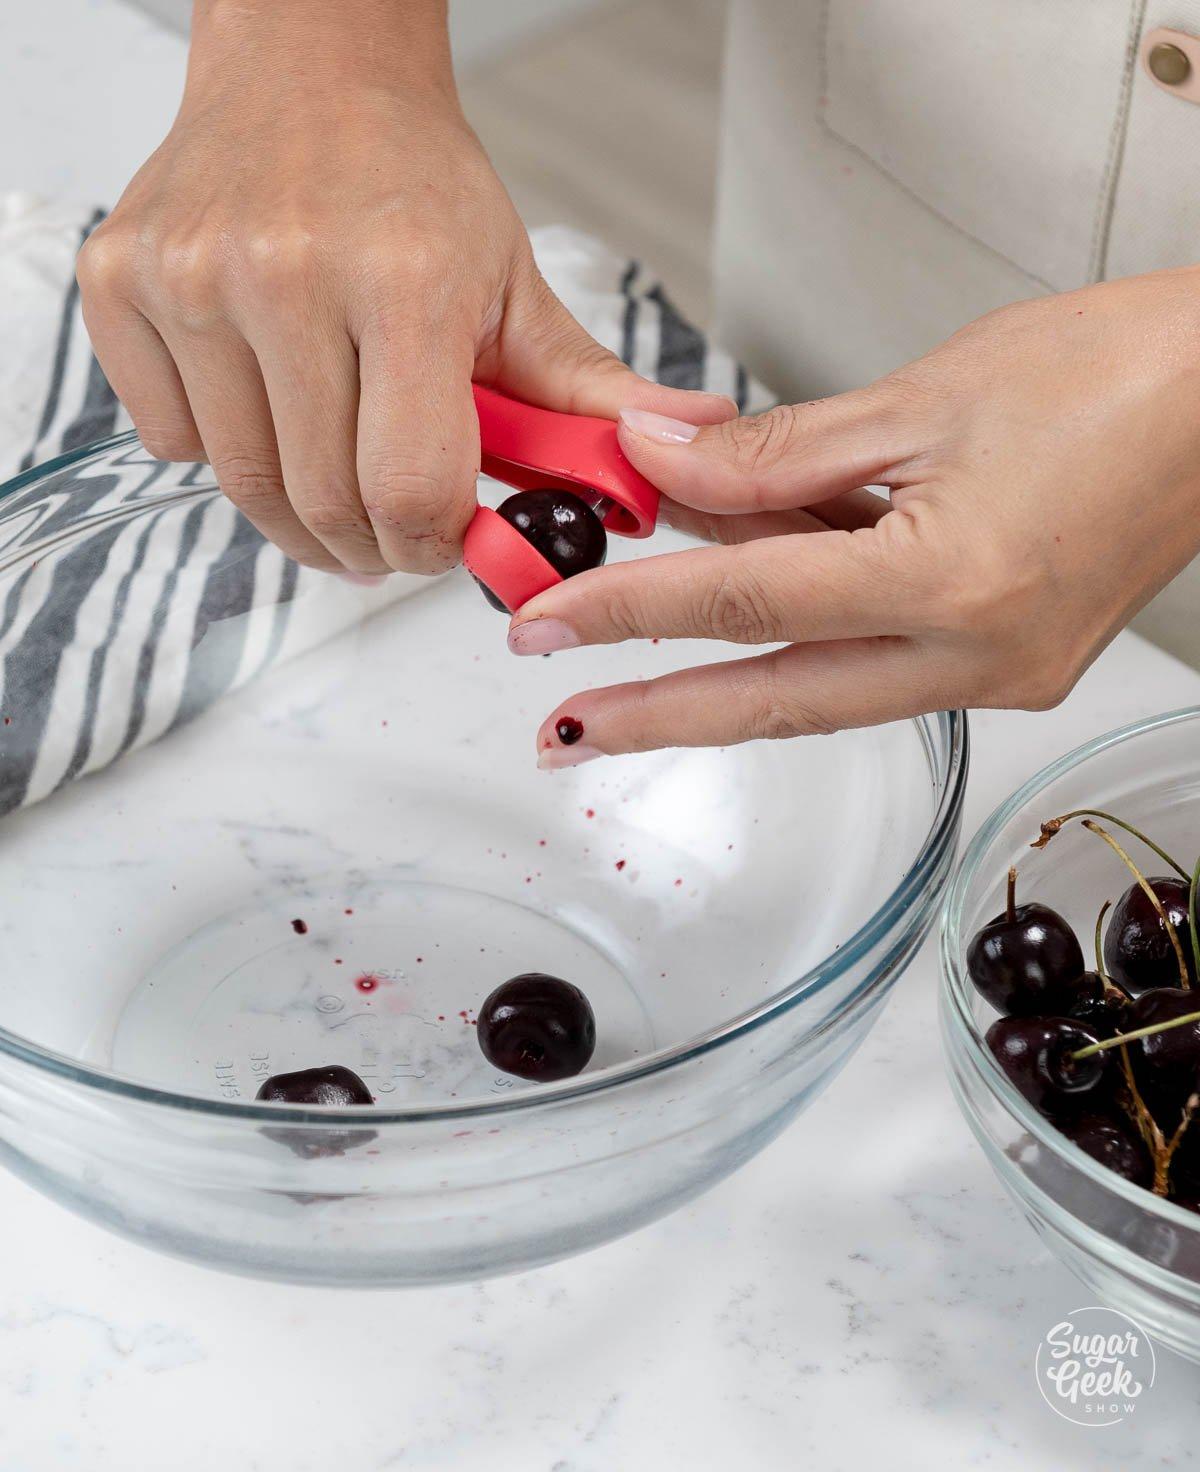 pitting fresh cherries into a bowl